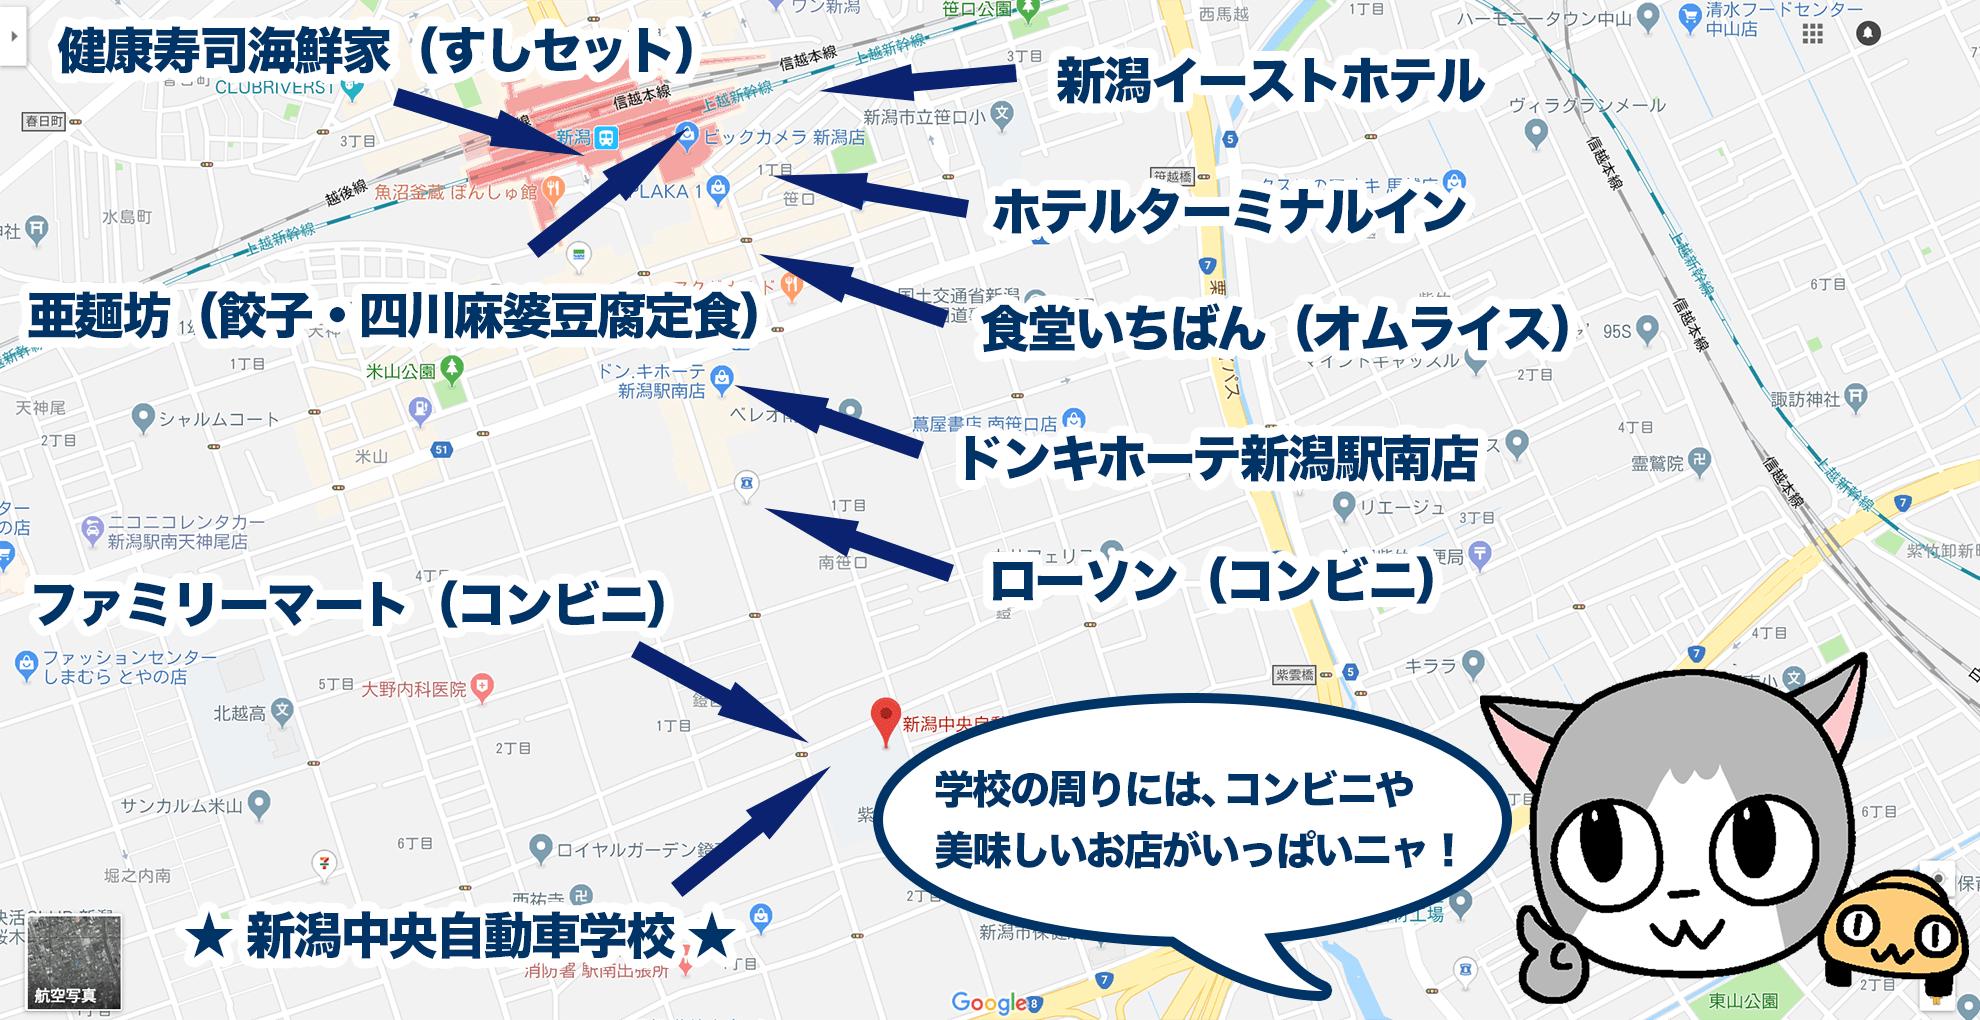 niigata-map-01